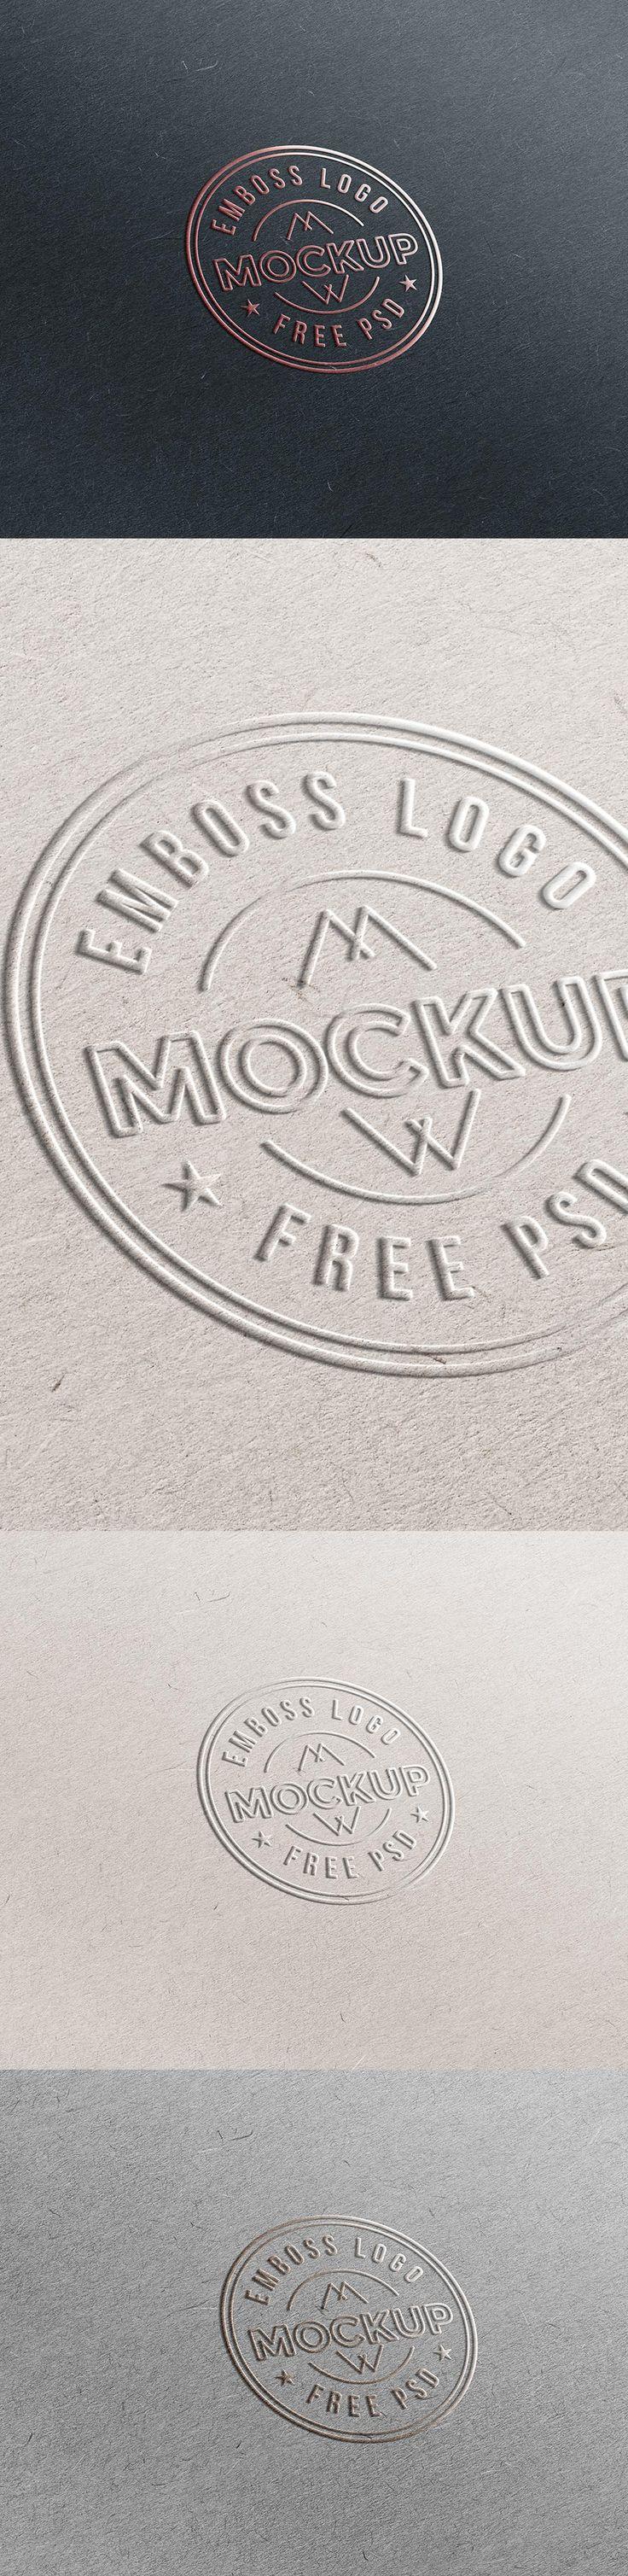 Emboss Paper #Logo #Mockup #PSD